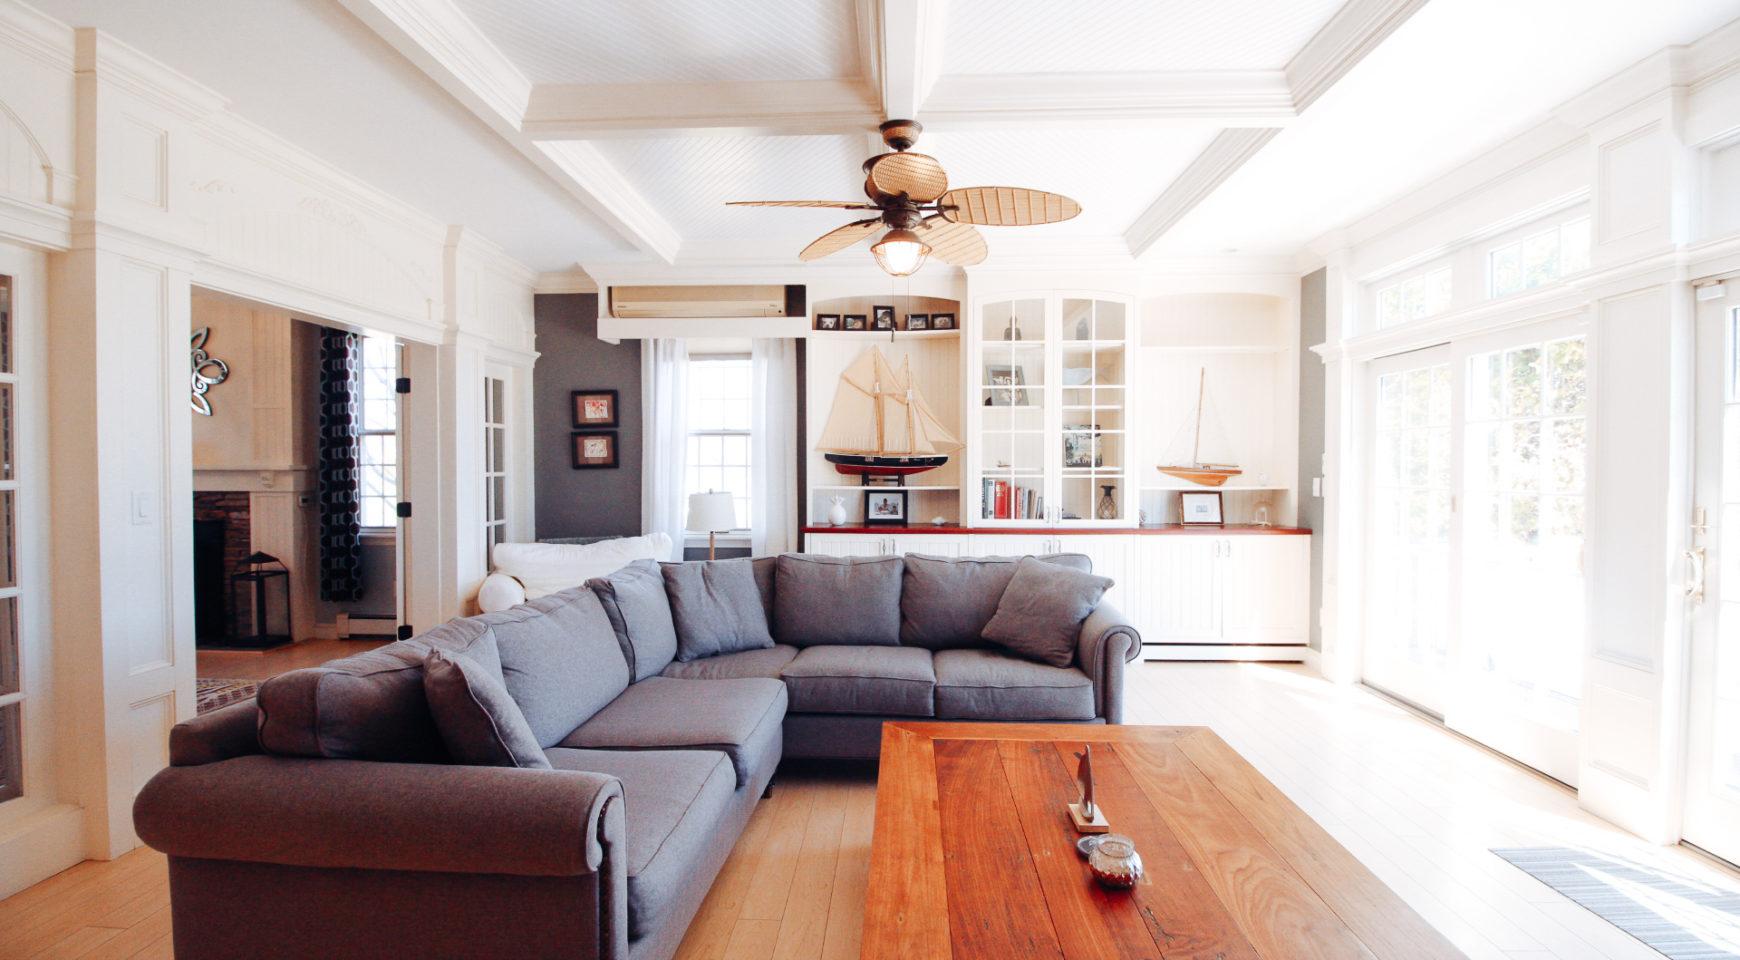 Luxe_and_Livable_Interior_Design_Blog_by_Maloney_Interiors_Newport_Rhode_Island_Fitzpatrick_Team_Remax_10.jpg